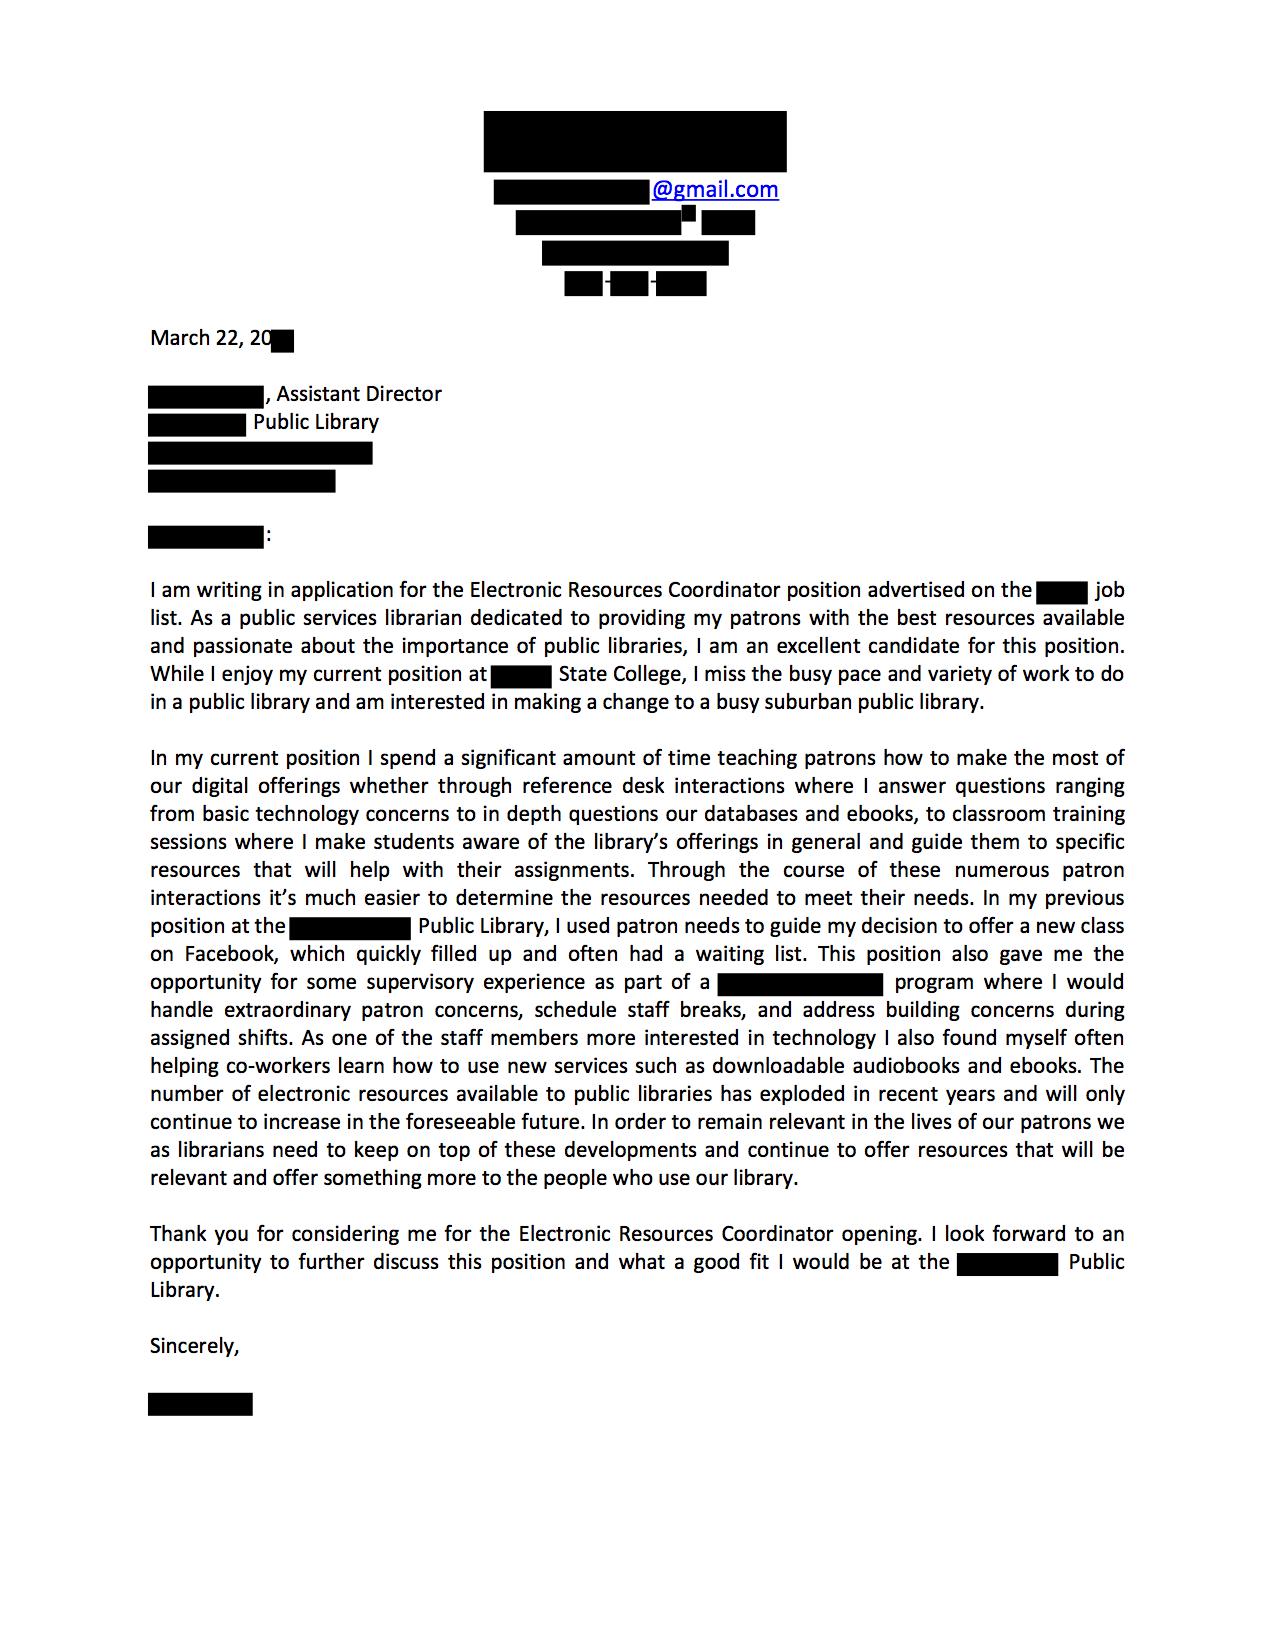 community service coordinator cover letter